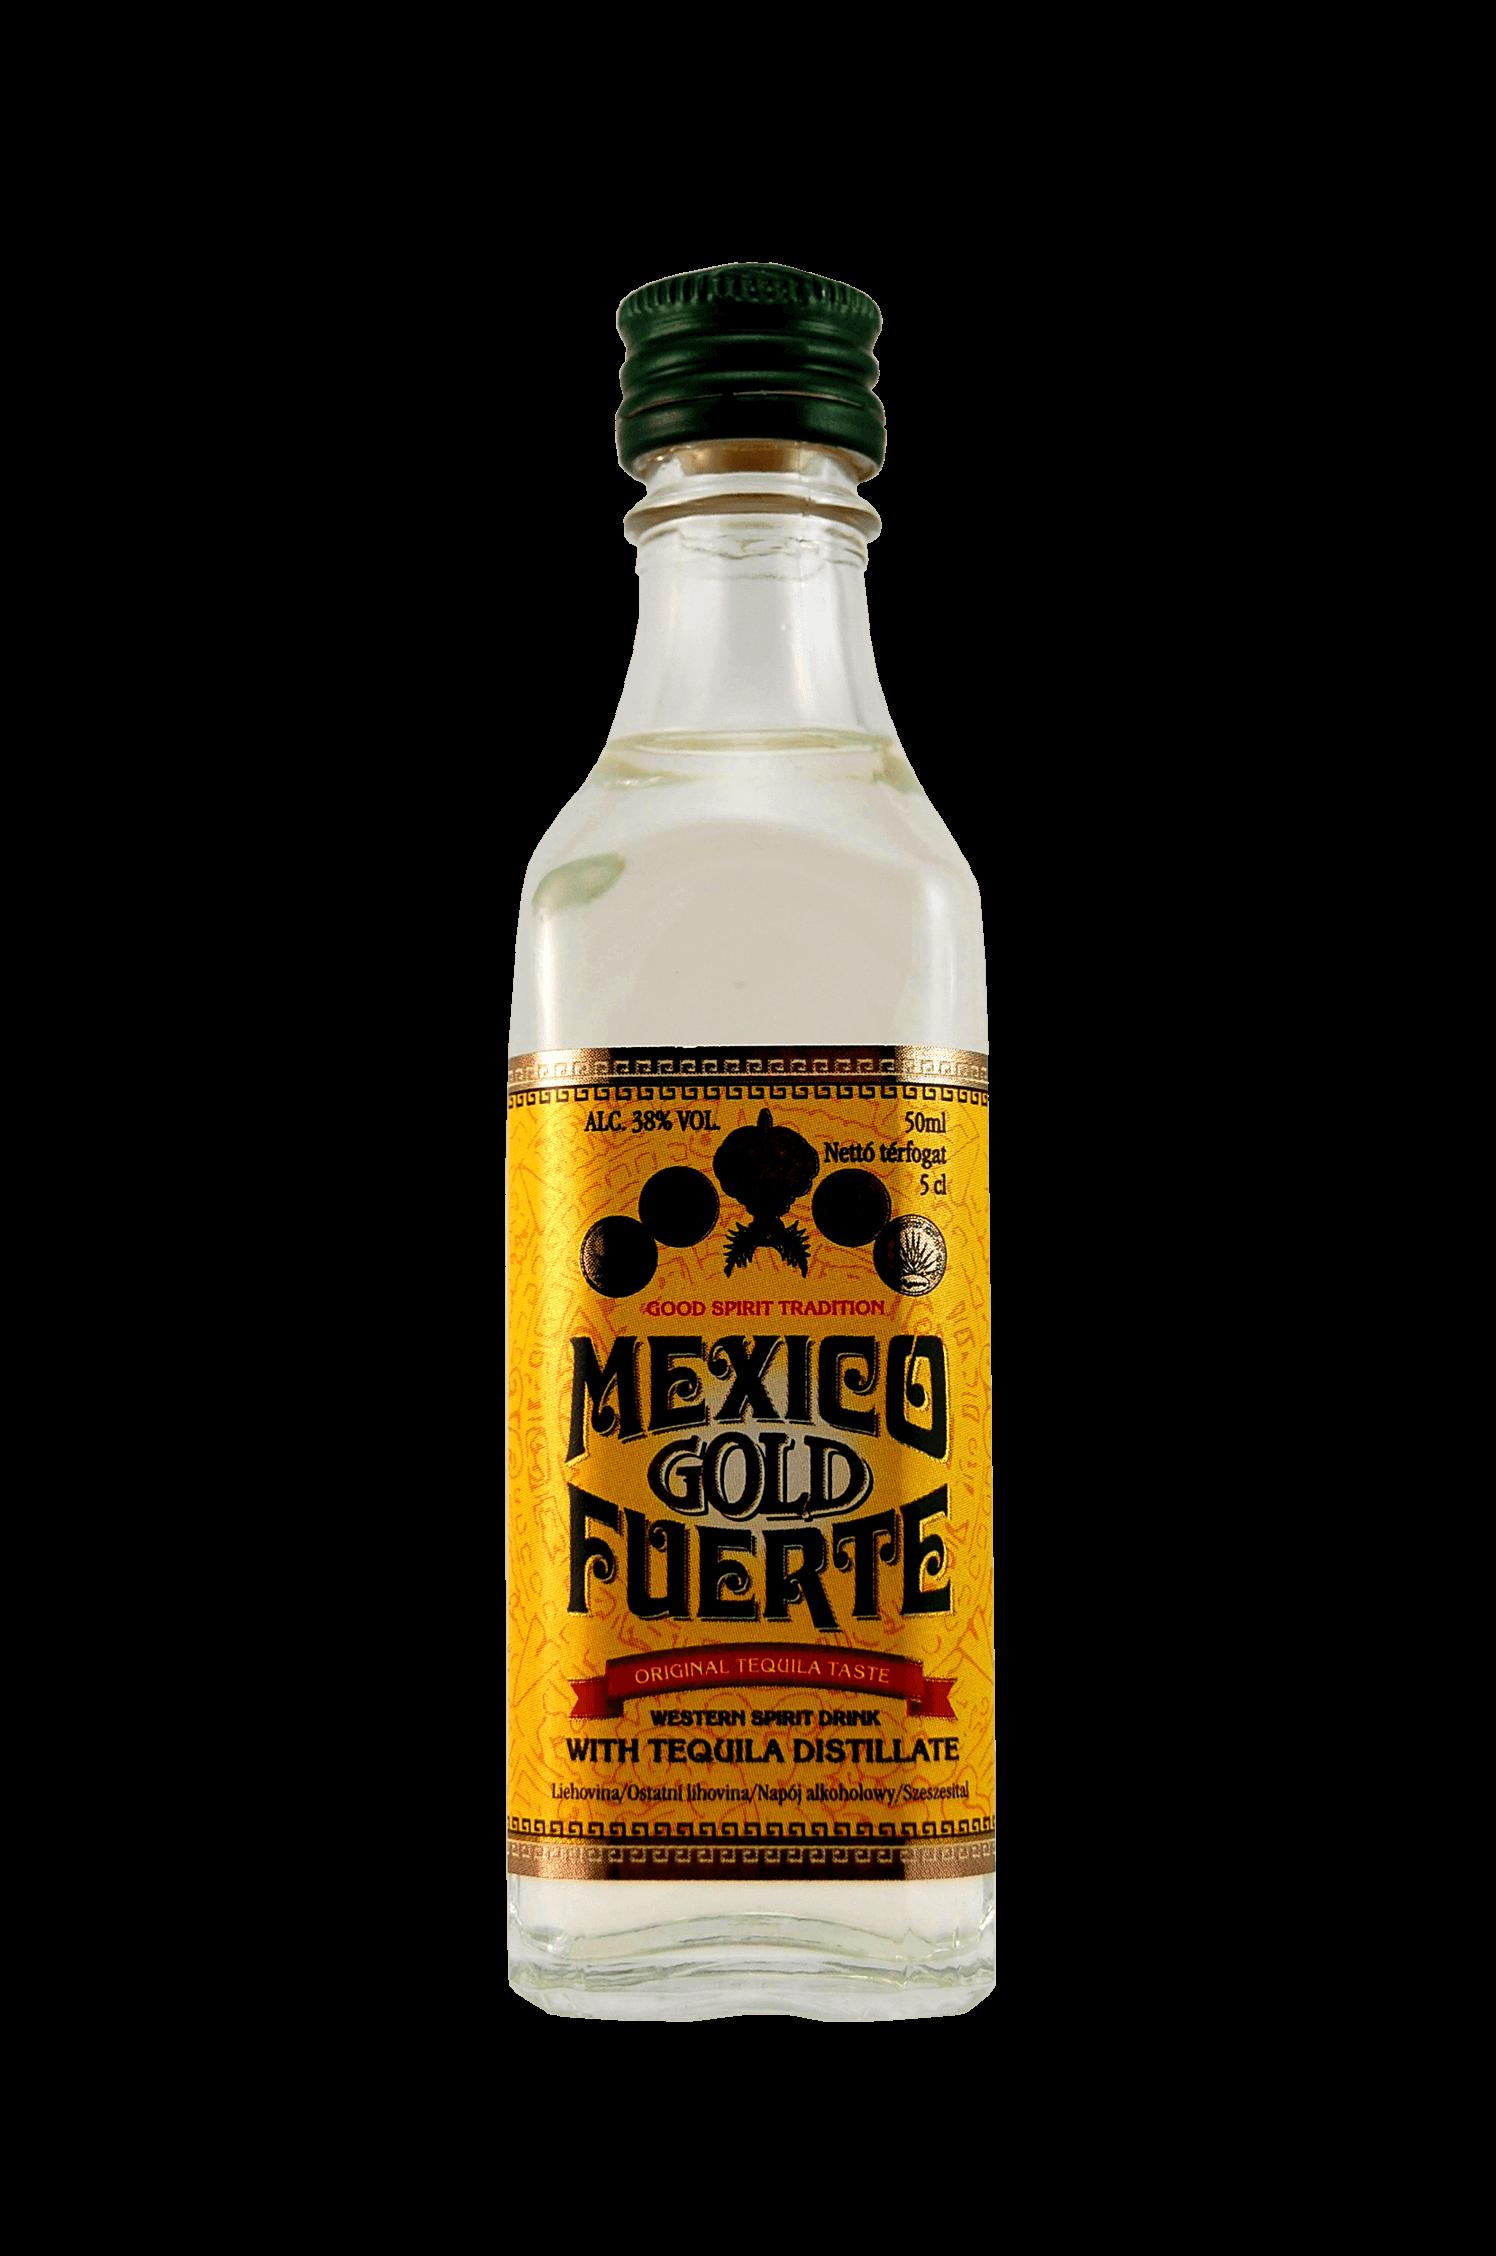 Mexico Gold Fuerte